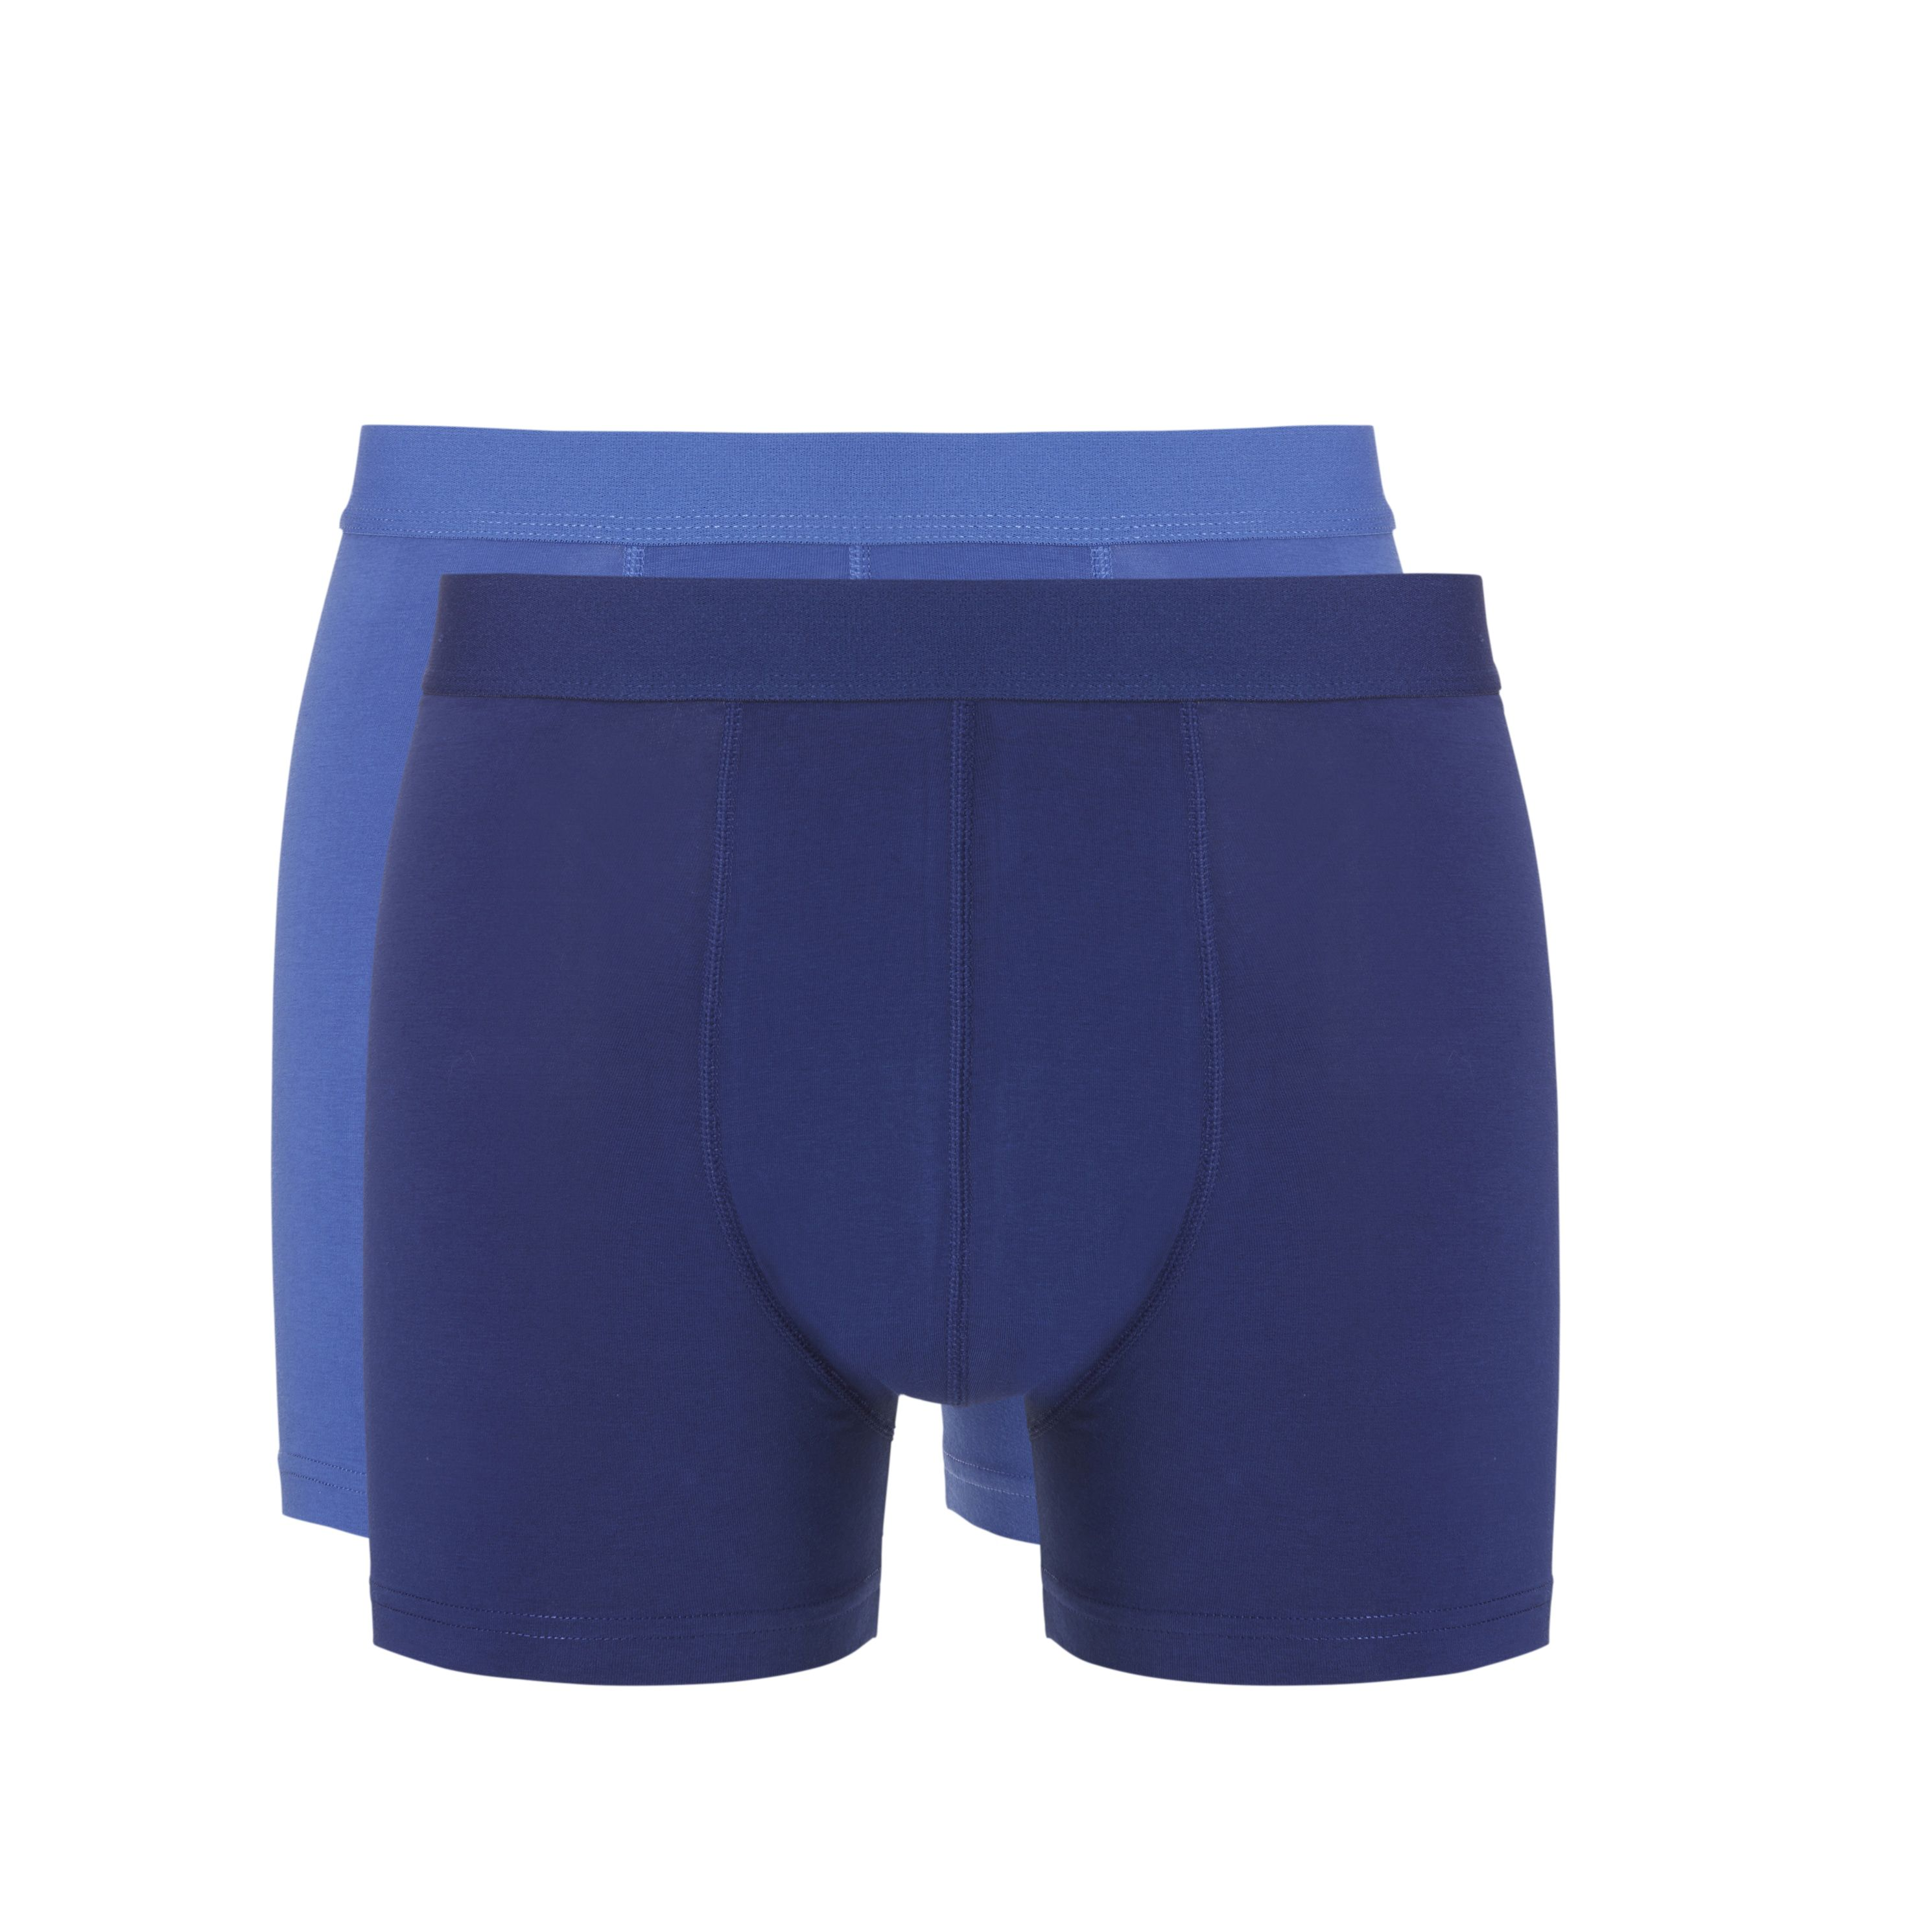 Ten Cate Heren Giftset 2-pack shorts Cobalt/Navy